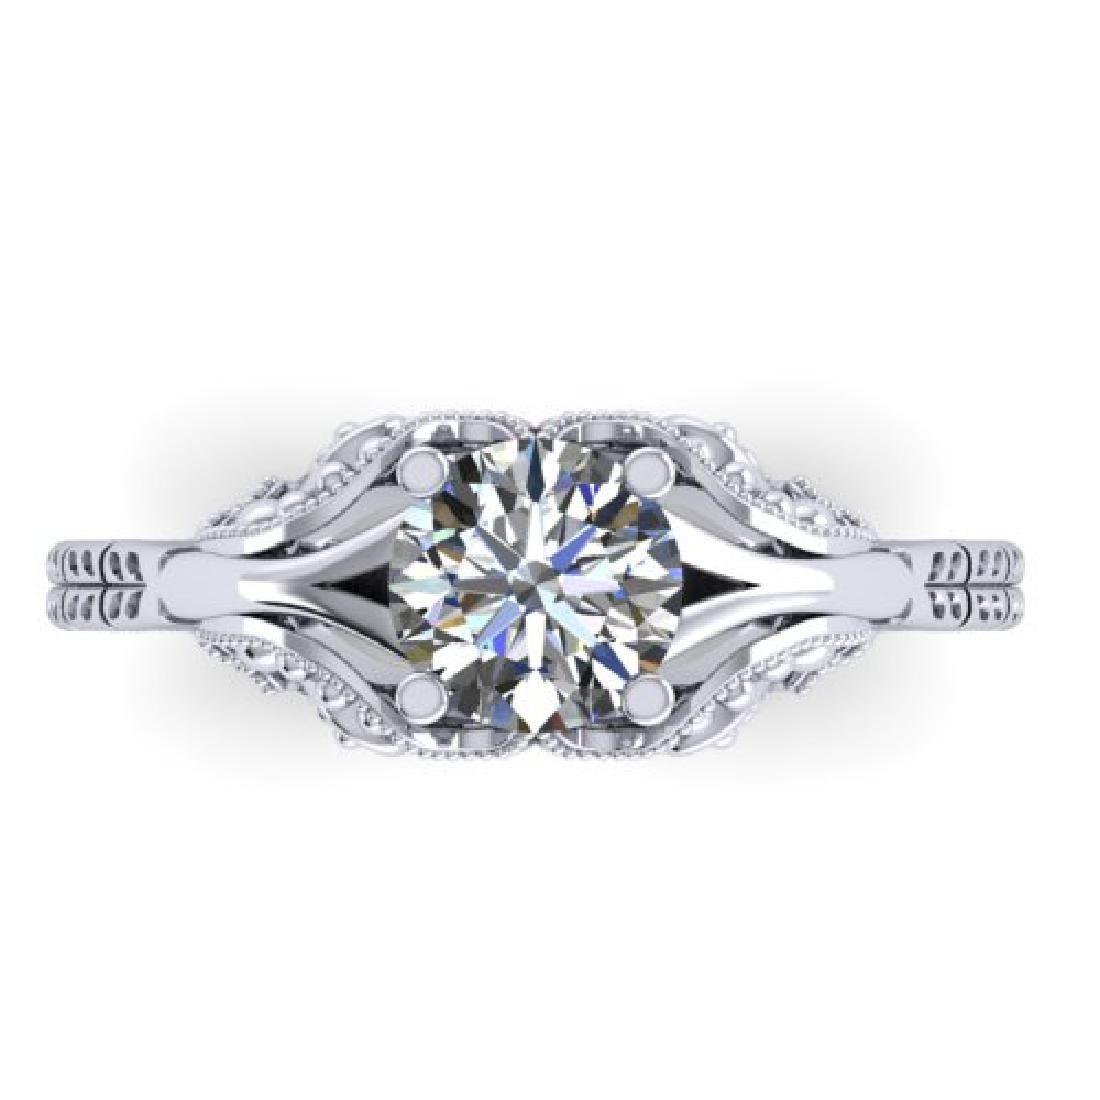 1 CTW Solitaire Certified VS/SI Diamond Ring 18K White